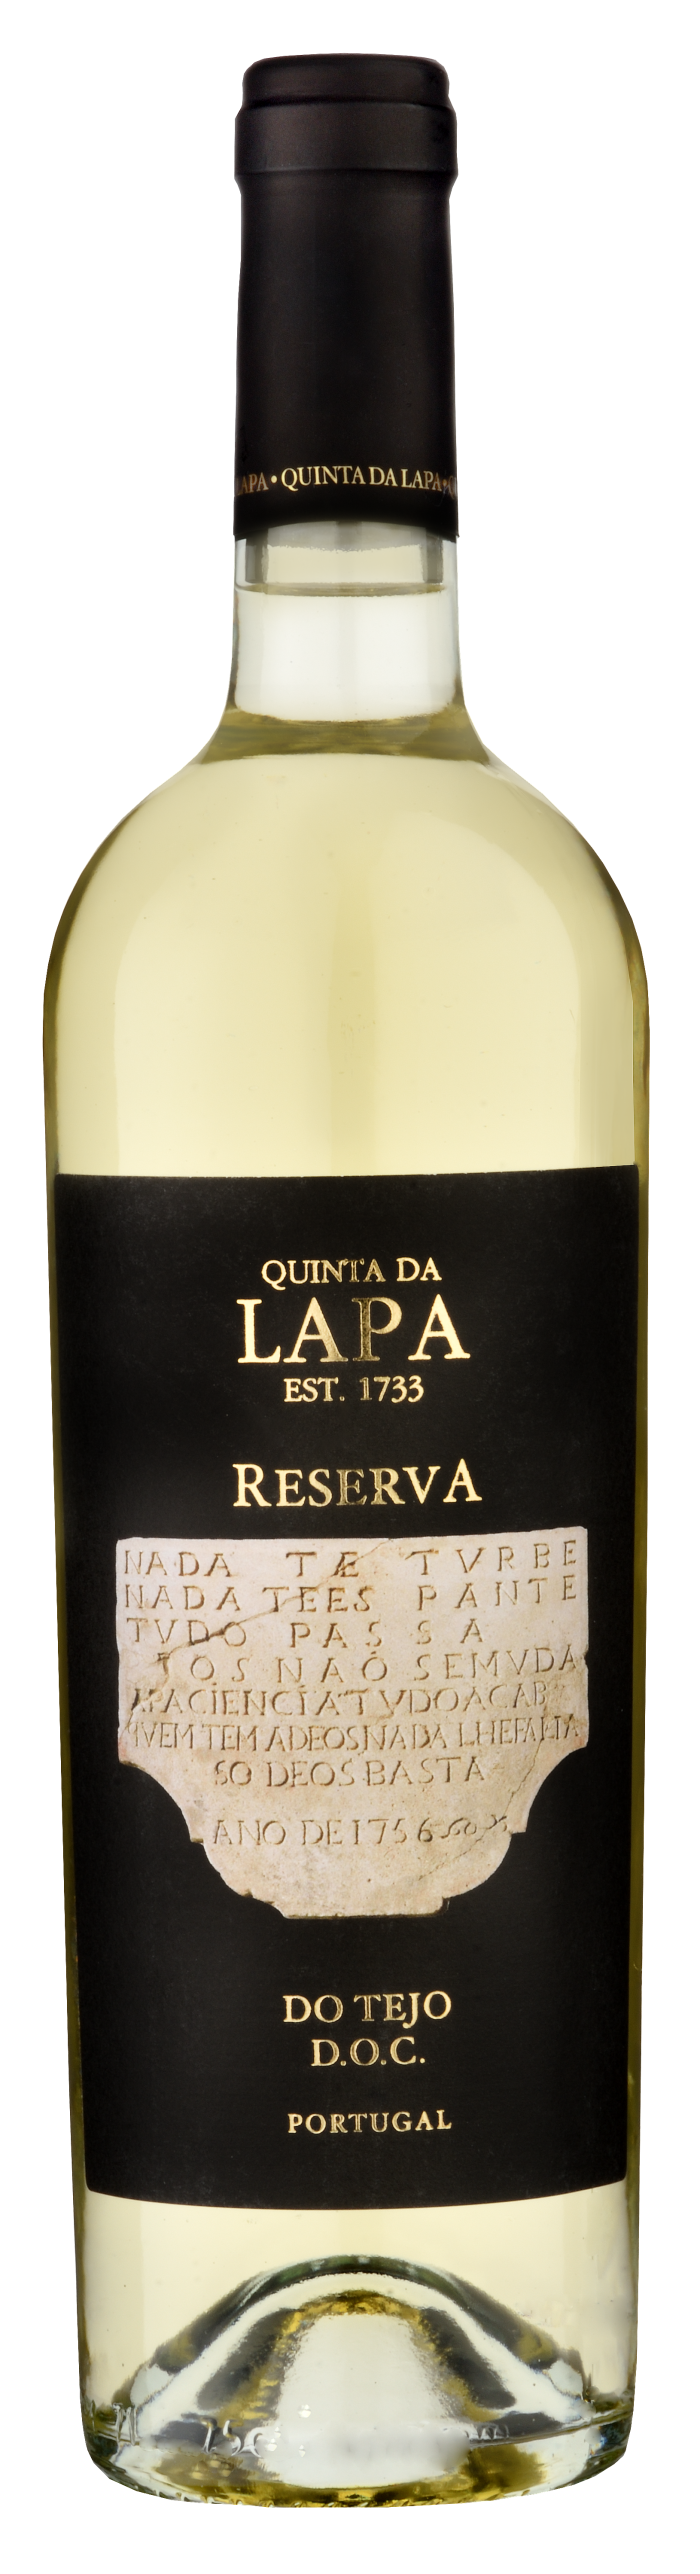 Quinta da Lapa Reserva Branco | Portugal | gemaakt van de druif: Arinto, Chardonnay, Viognier